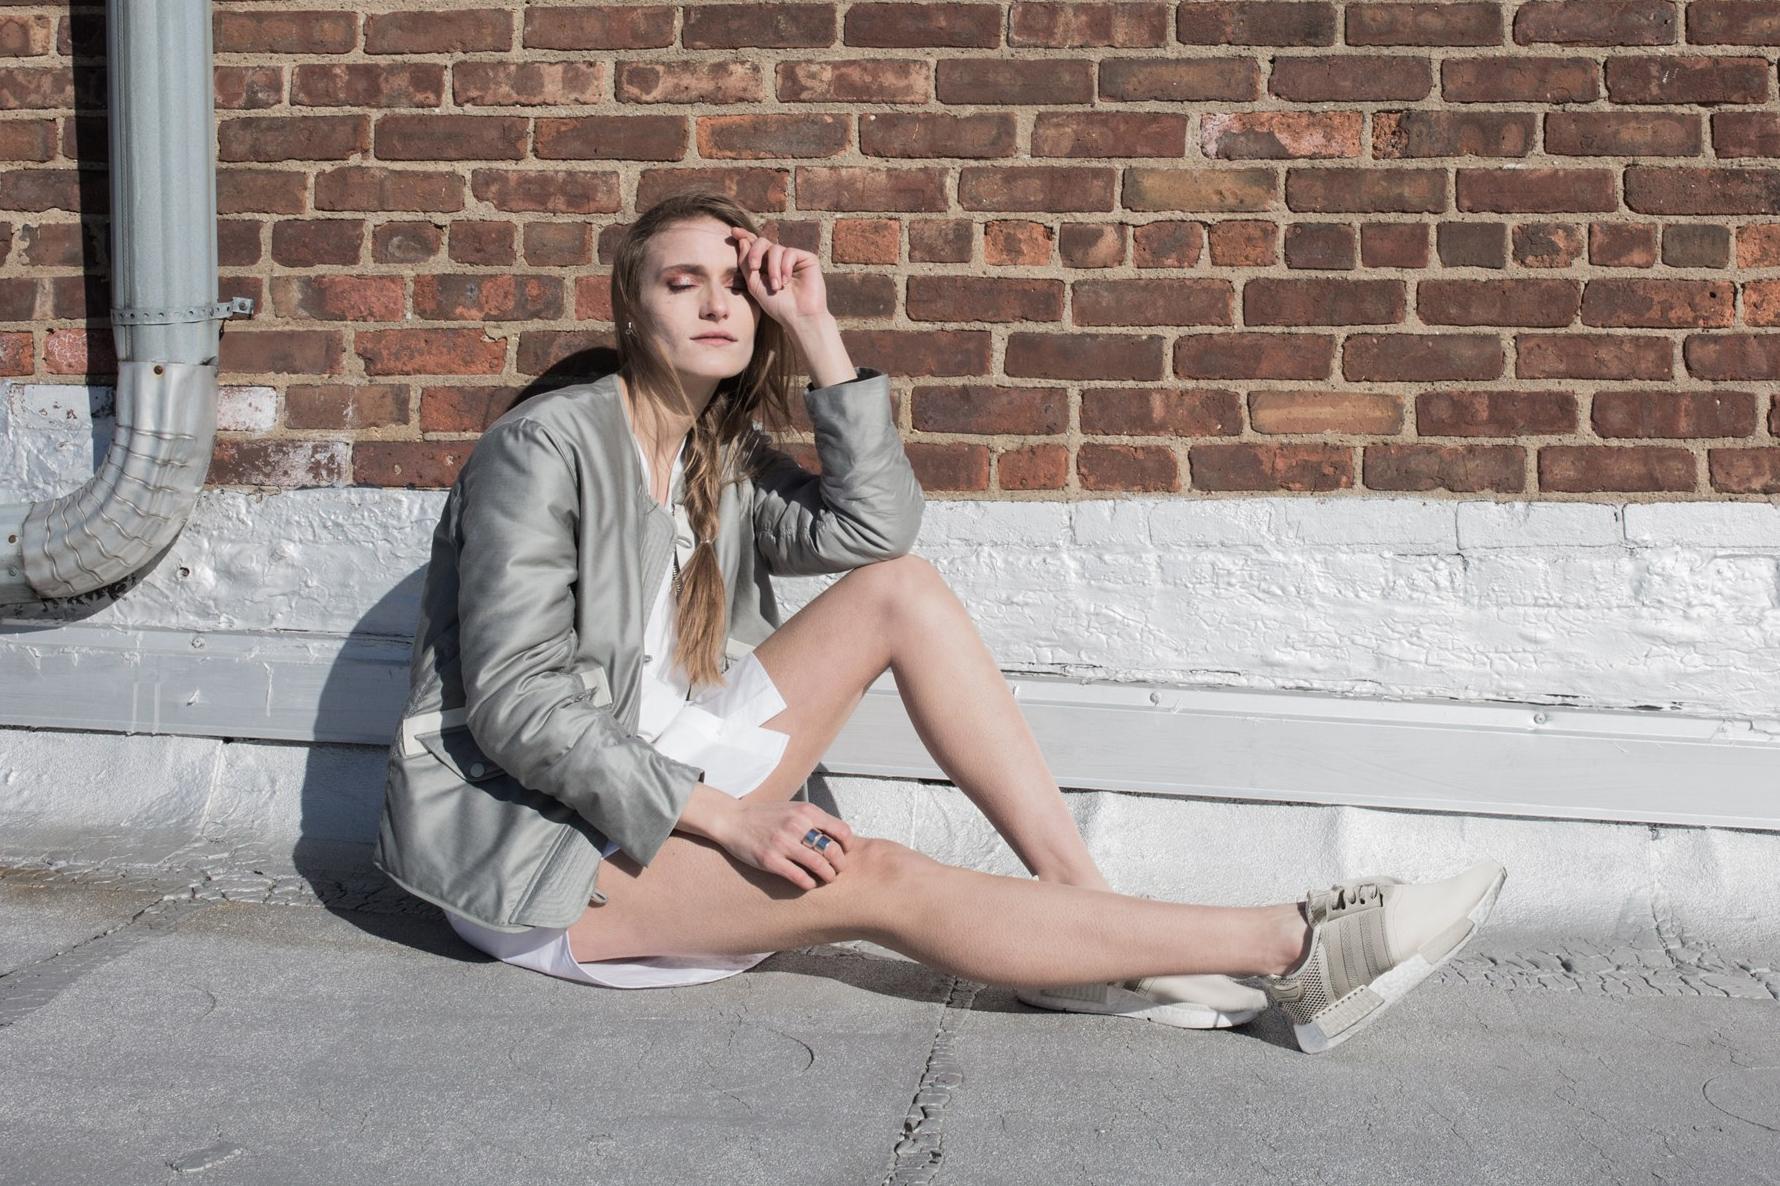 The adidas Originals' NMD & Tubular 2016 Spring/Summer Lookbooks Get 10 Unlikely Stylists